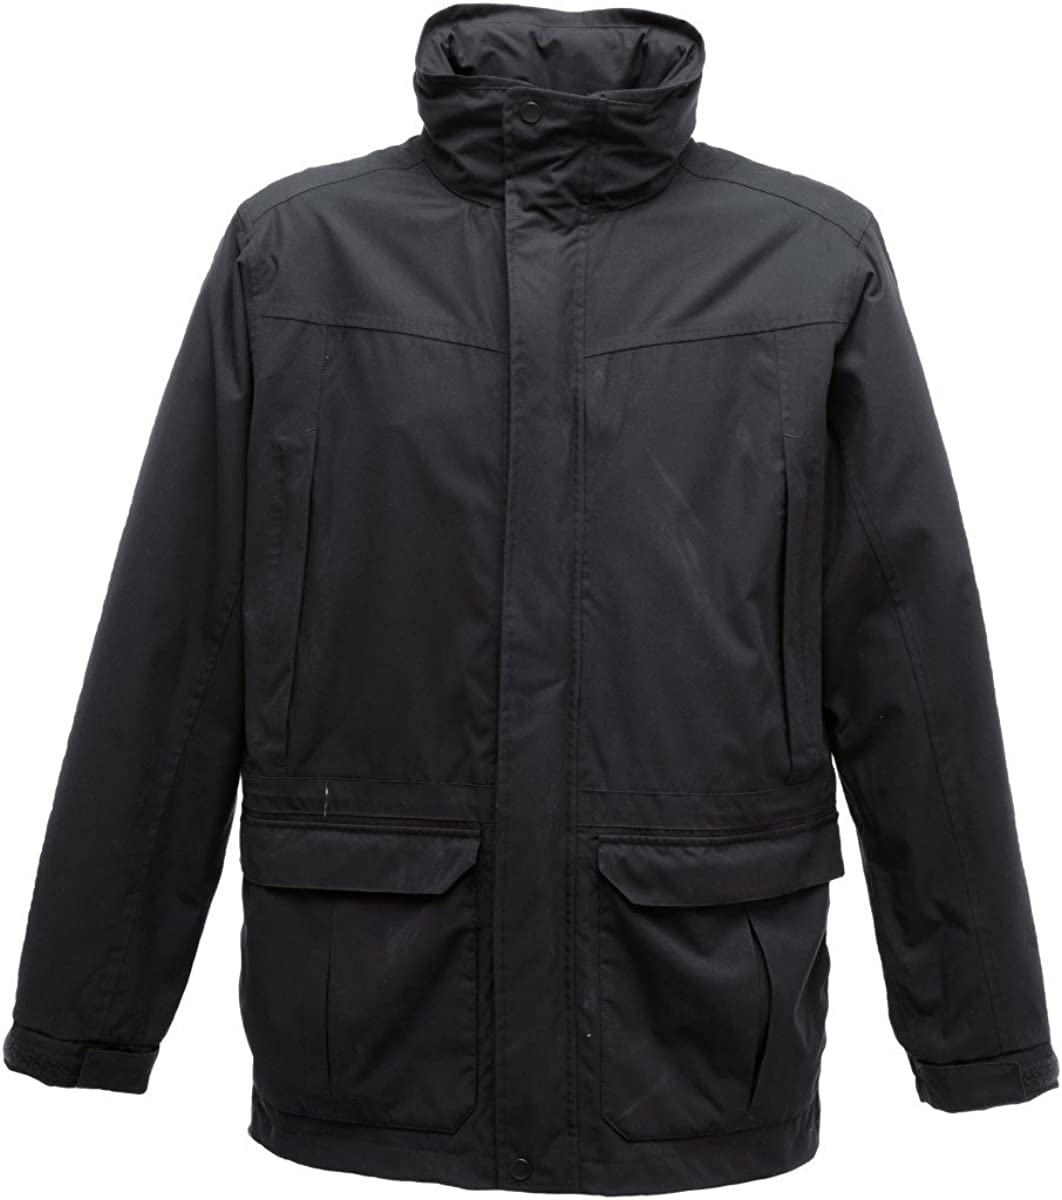 Regatta Mens Vertex III Waterproof Breathable Jacket